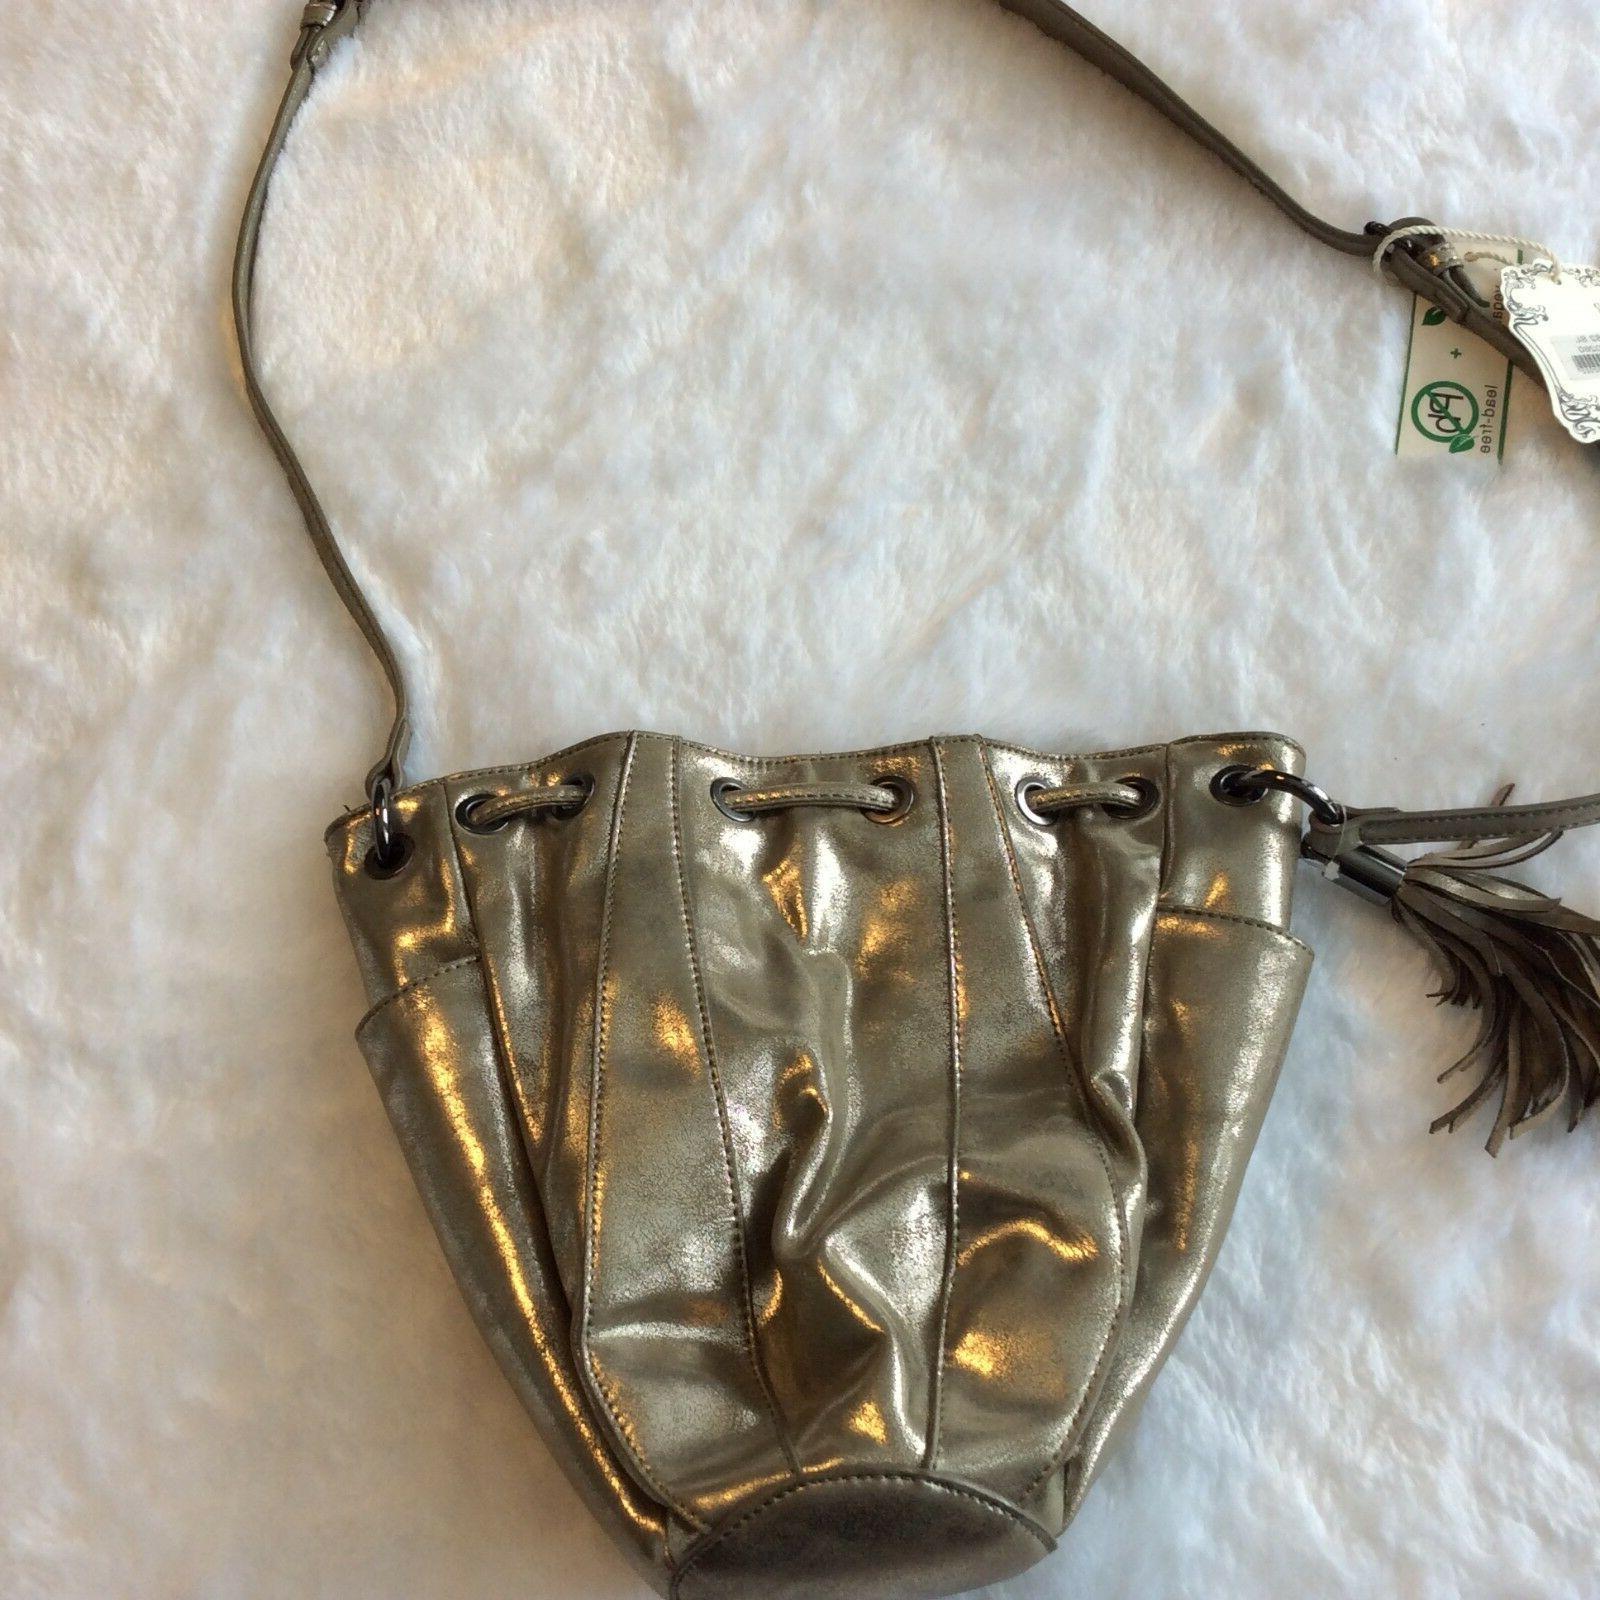 Alyssa Purse Bag Gold Taupe Medium Tassel